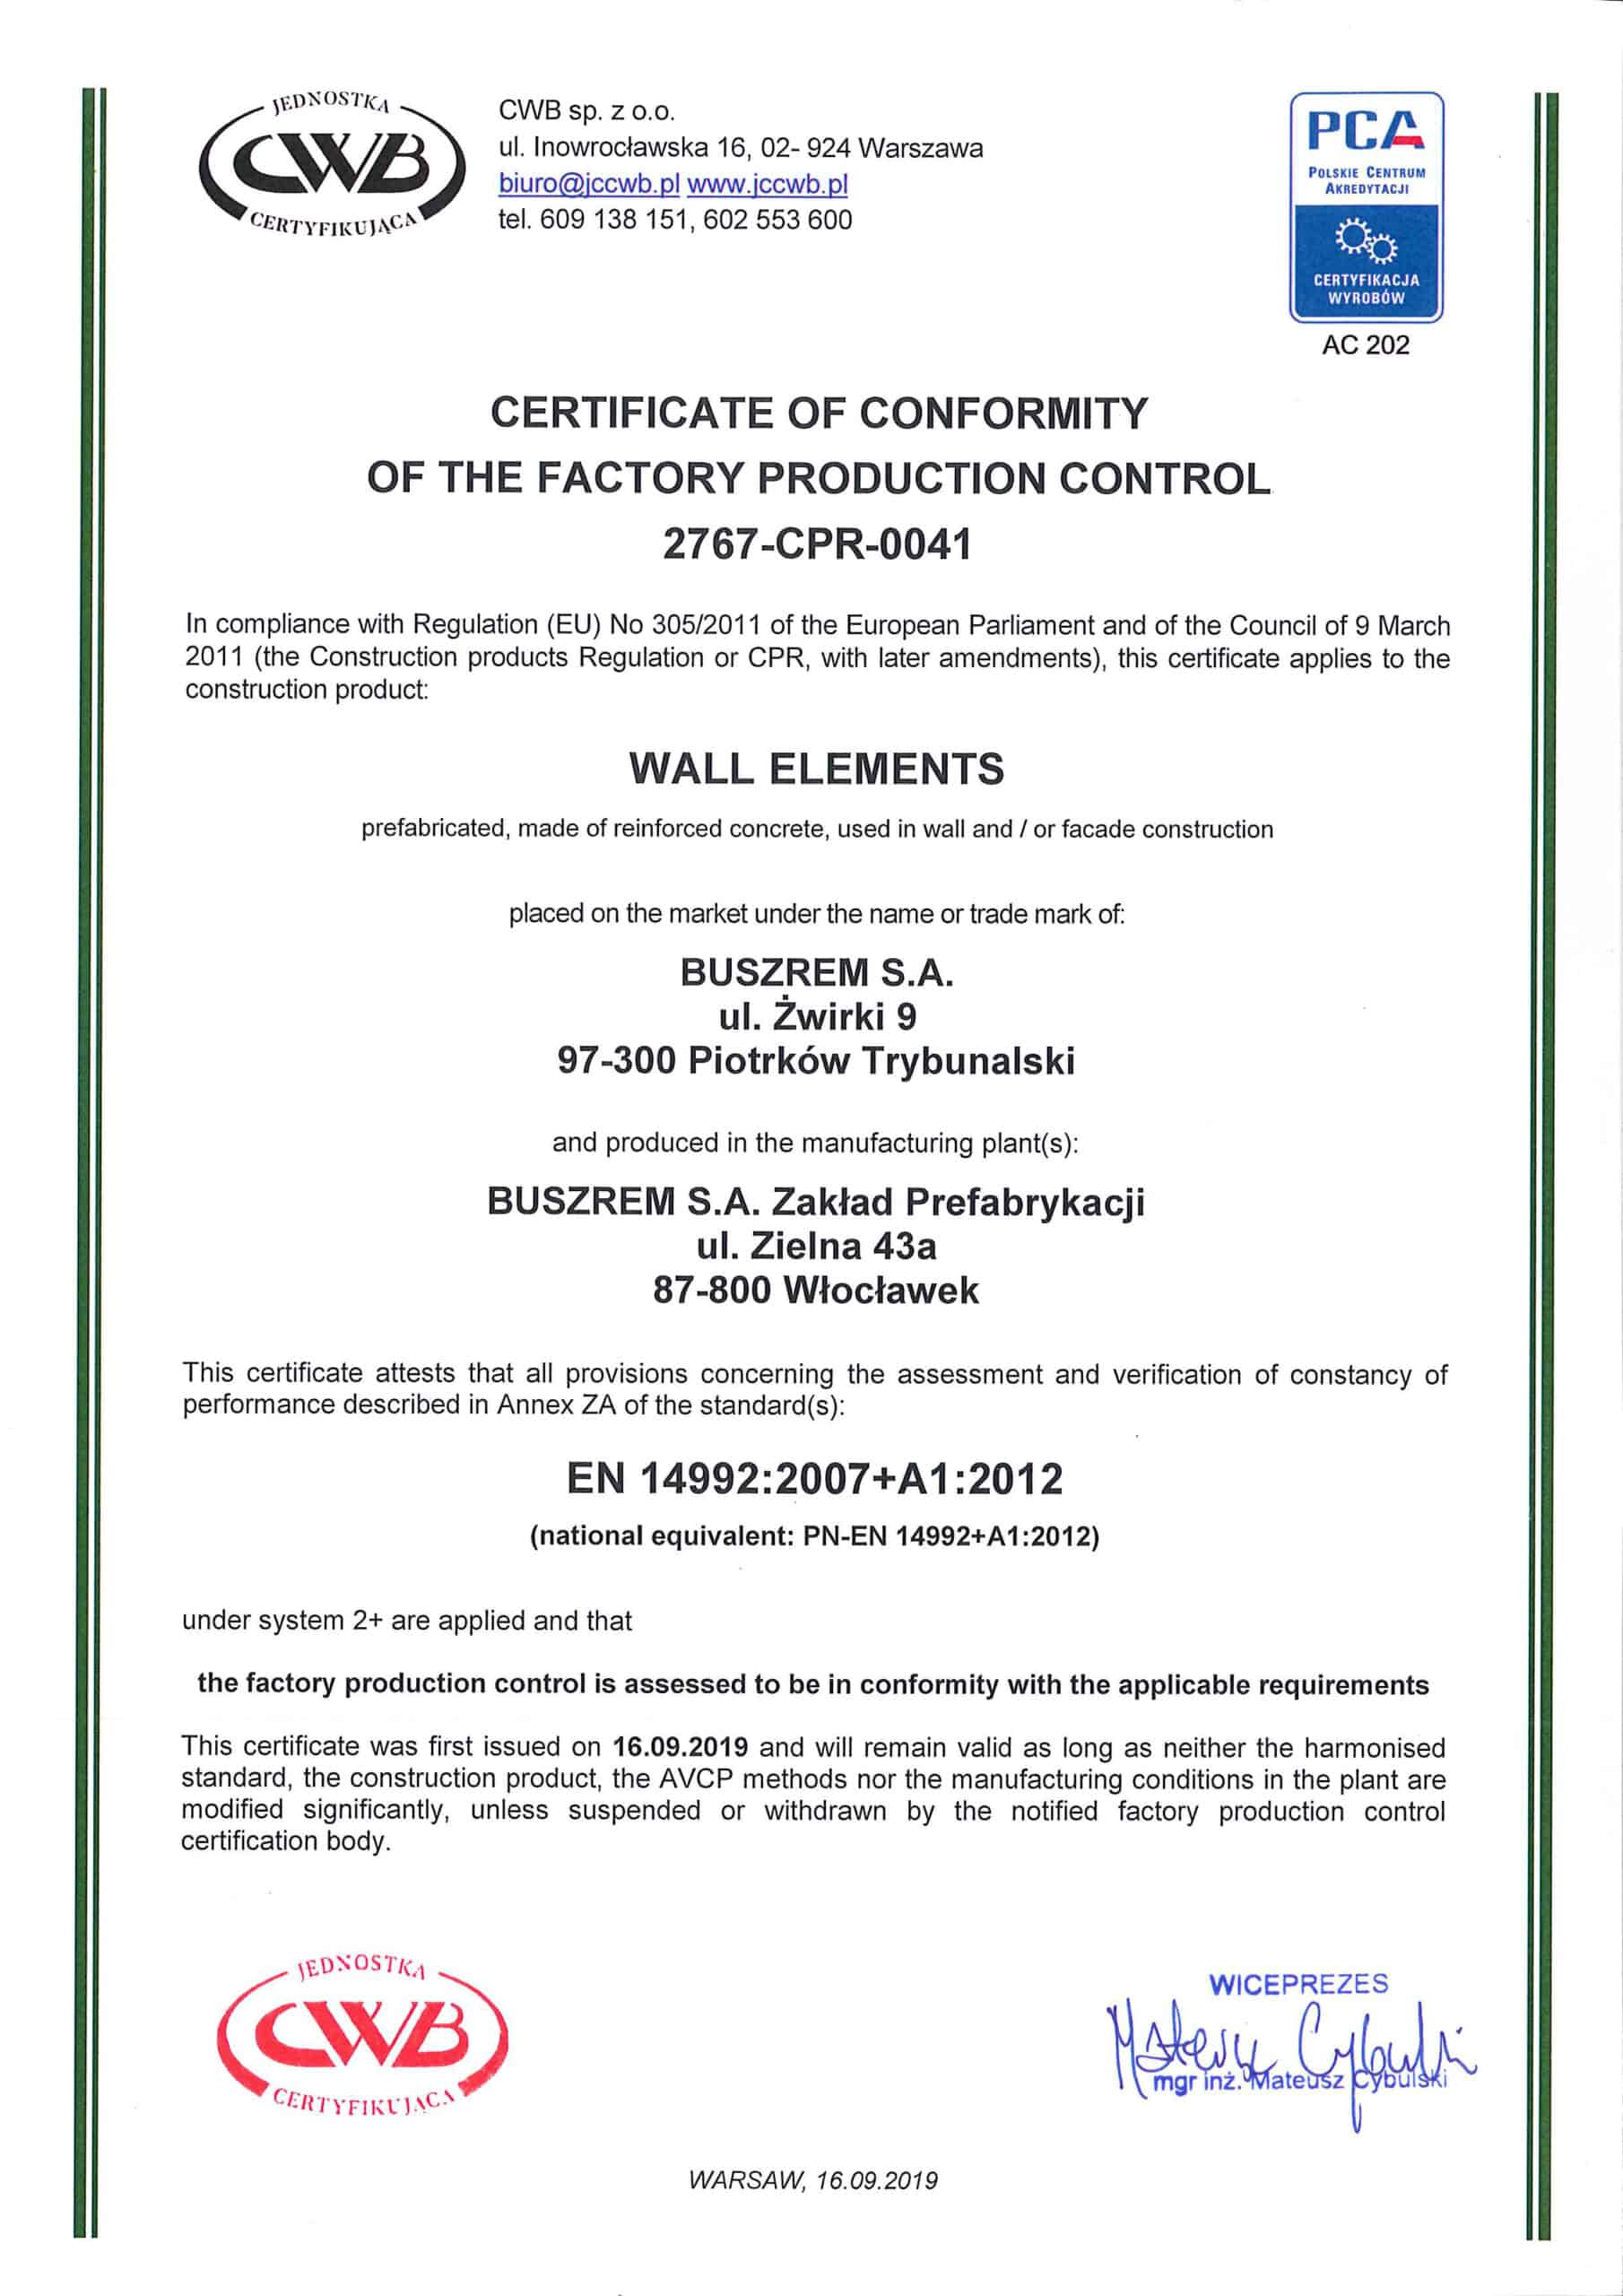 Buszrem SA - certyfikaty